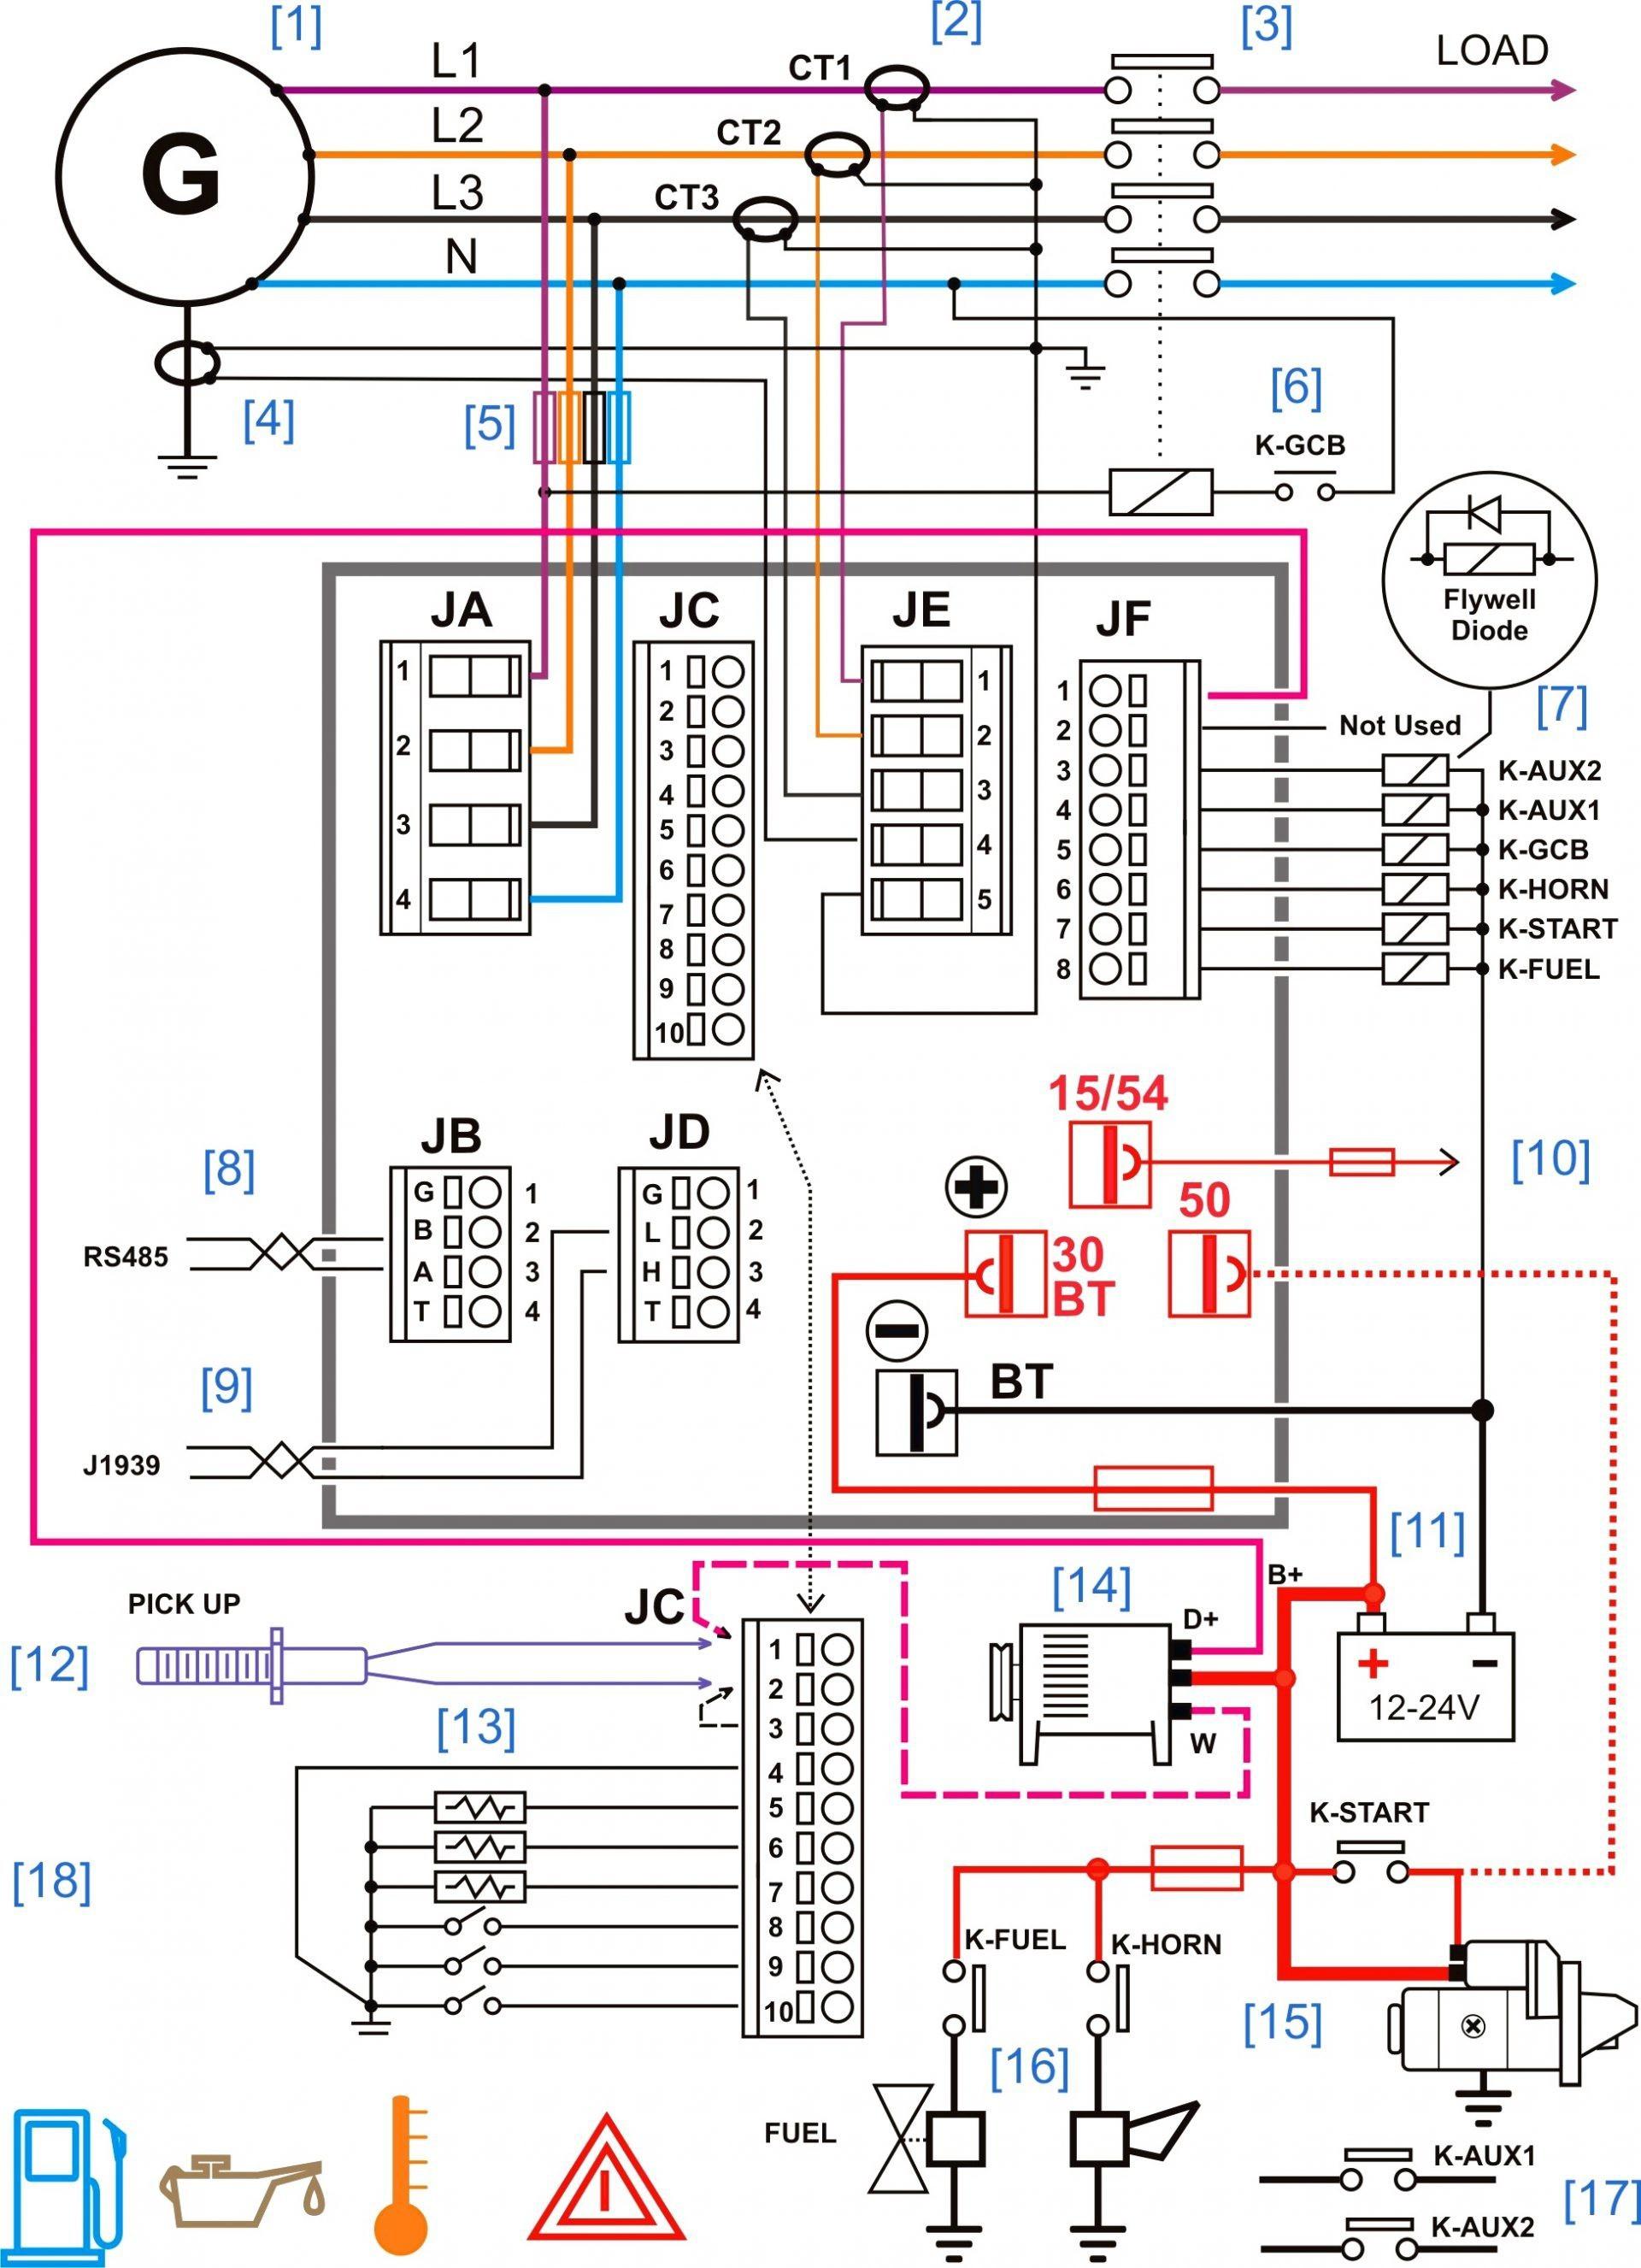 Fire Alarm Wiring Diagram Fresh Motion Sensor Wiring Diagram Diagram Of Fire Alarm Wiring Diagram